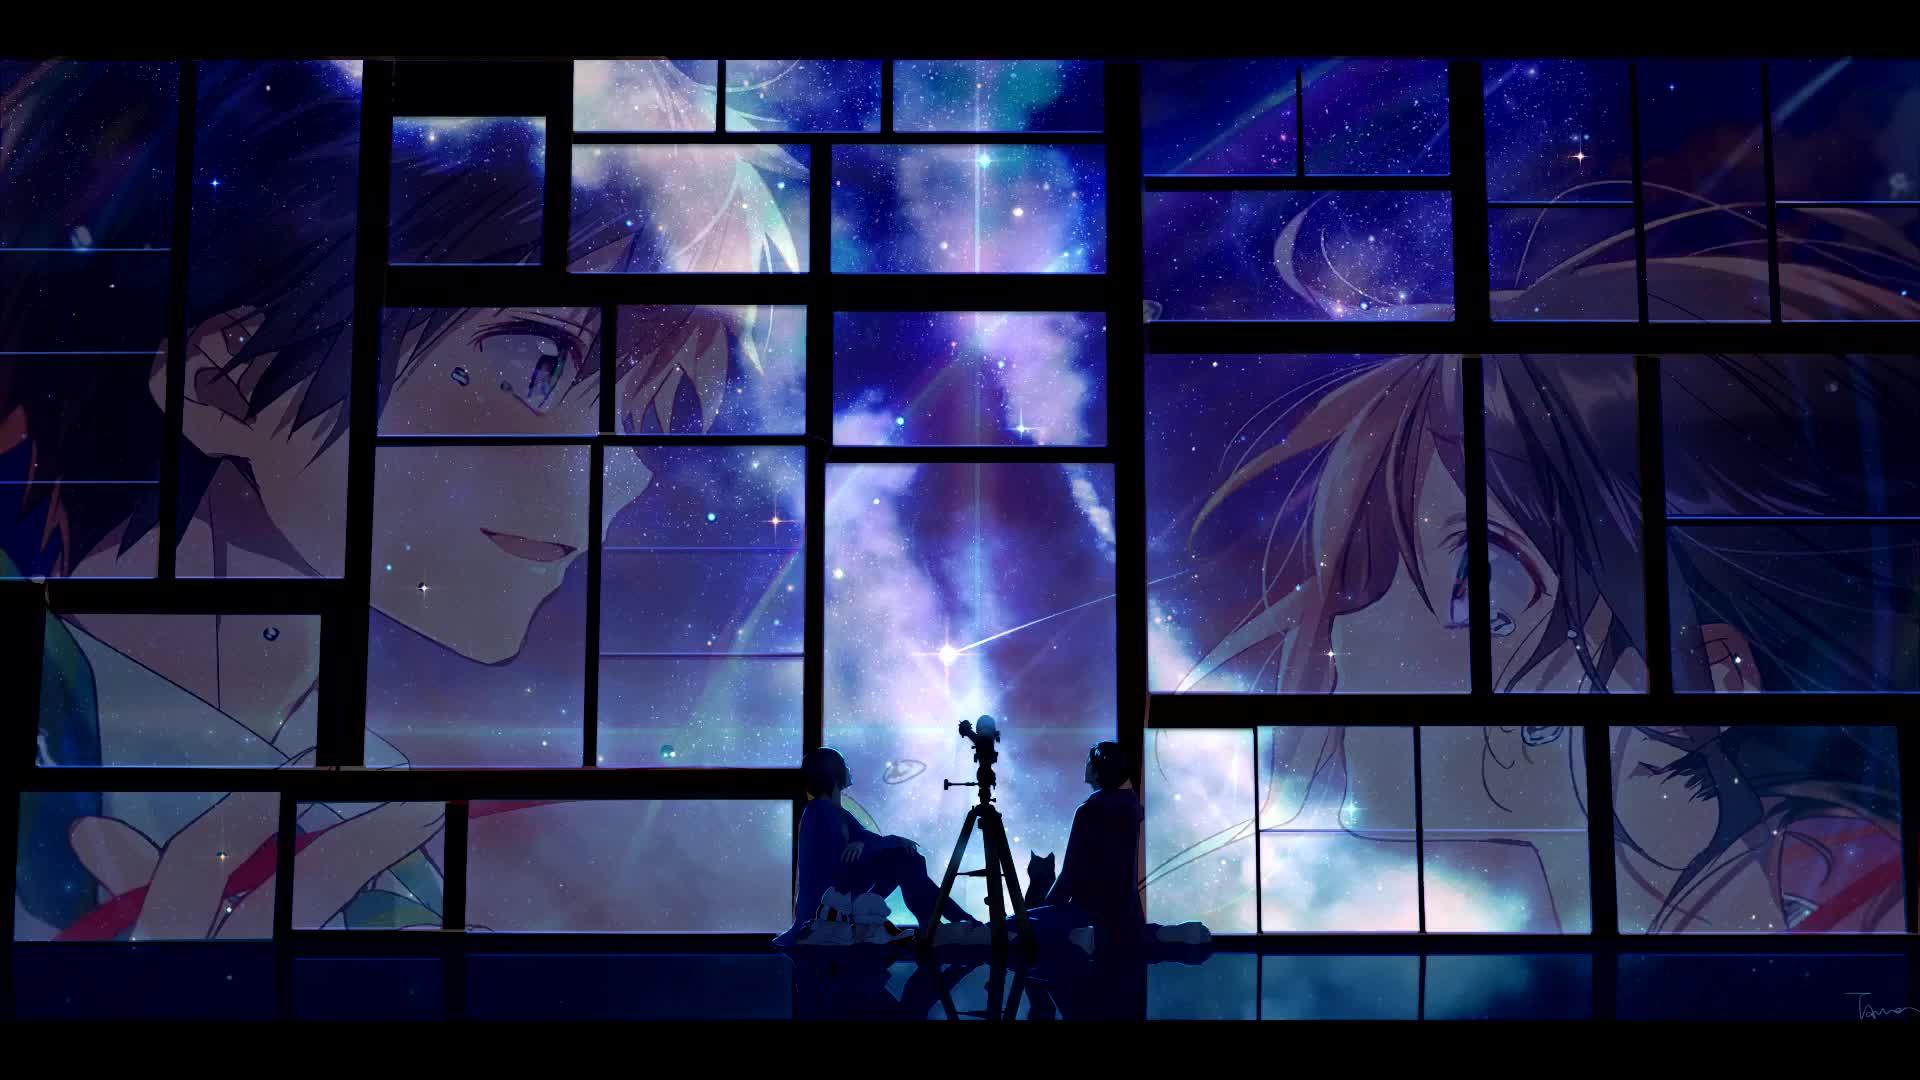 What is a live wallpaper? Kimi No Nawa Live Wallpaper Hd - Anime Wallpaper HD